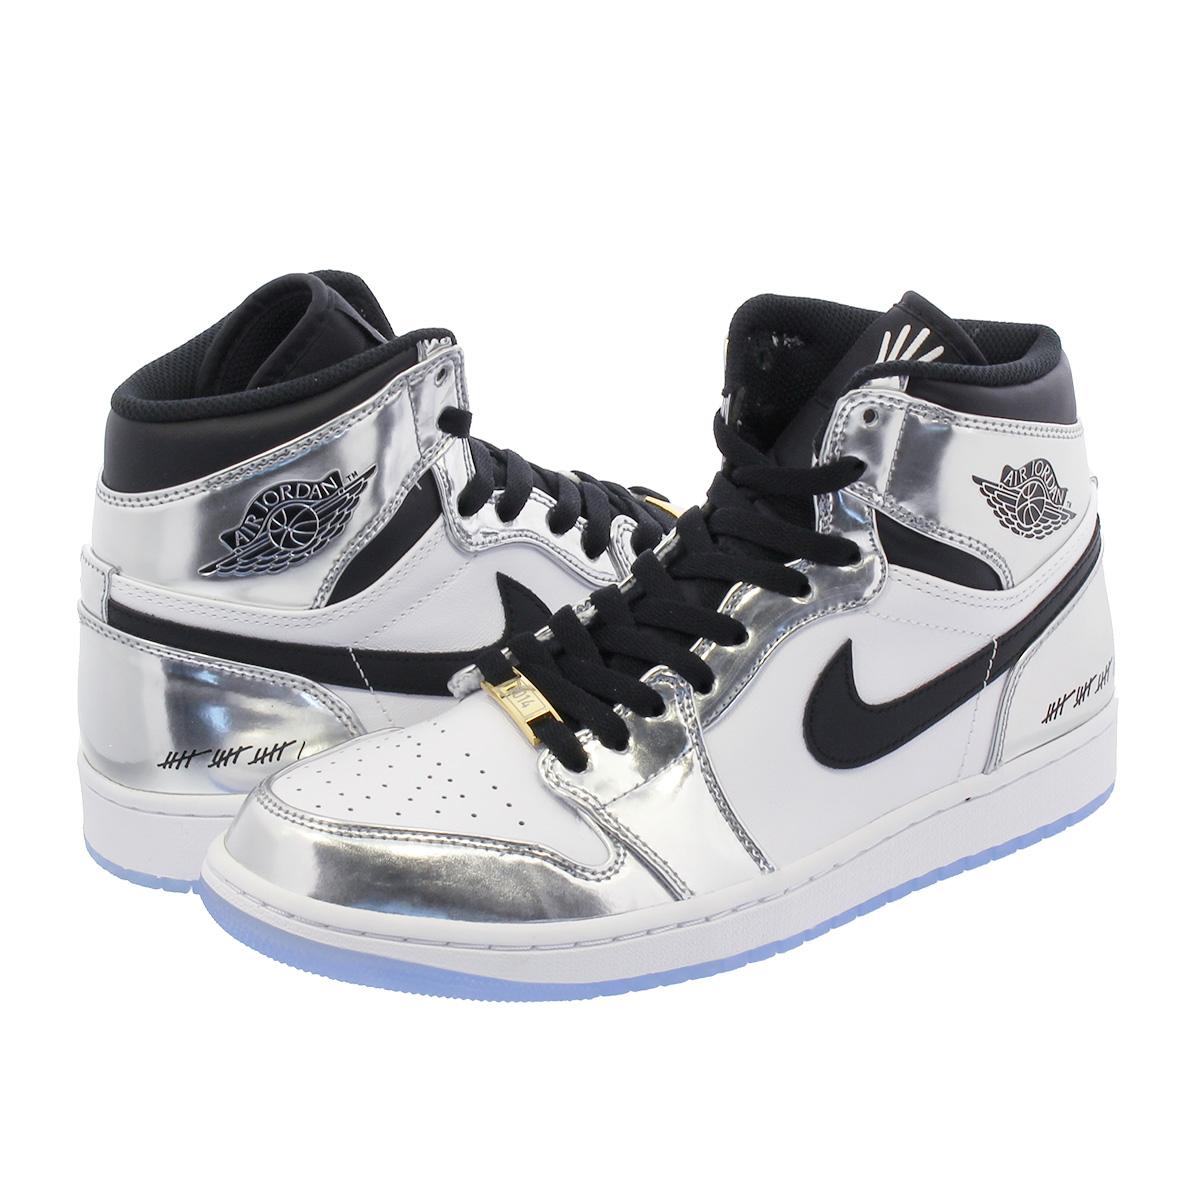 NIKE AIR JORDAN 1 RETRO HIGH THINK 16 Nike Air Jordan 1 nostalgic high sink  16 CHROME BLACK WHITE TURBO GREEN aq7476-016 1d266e91ee9